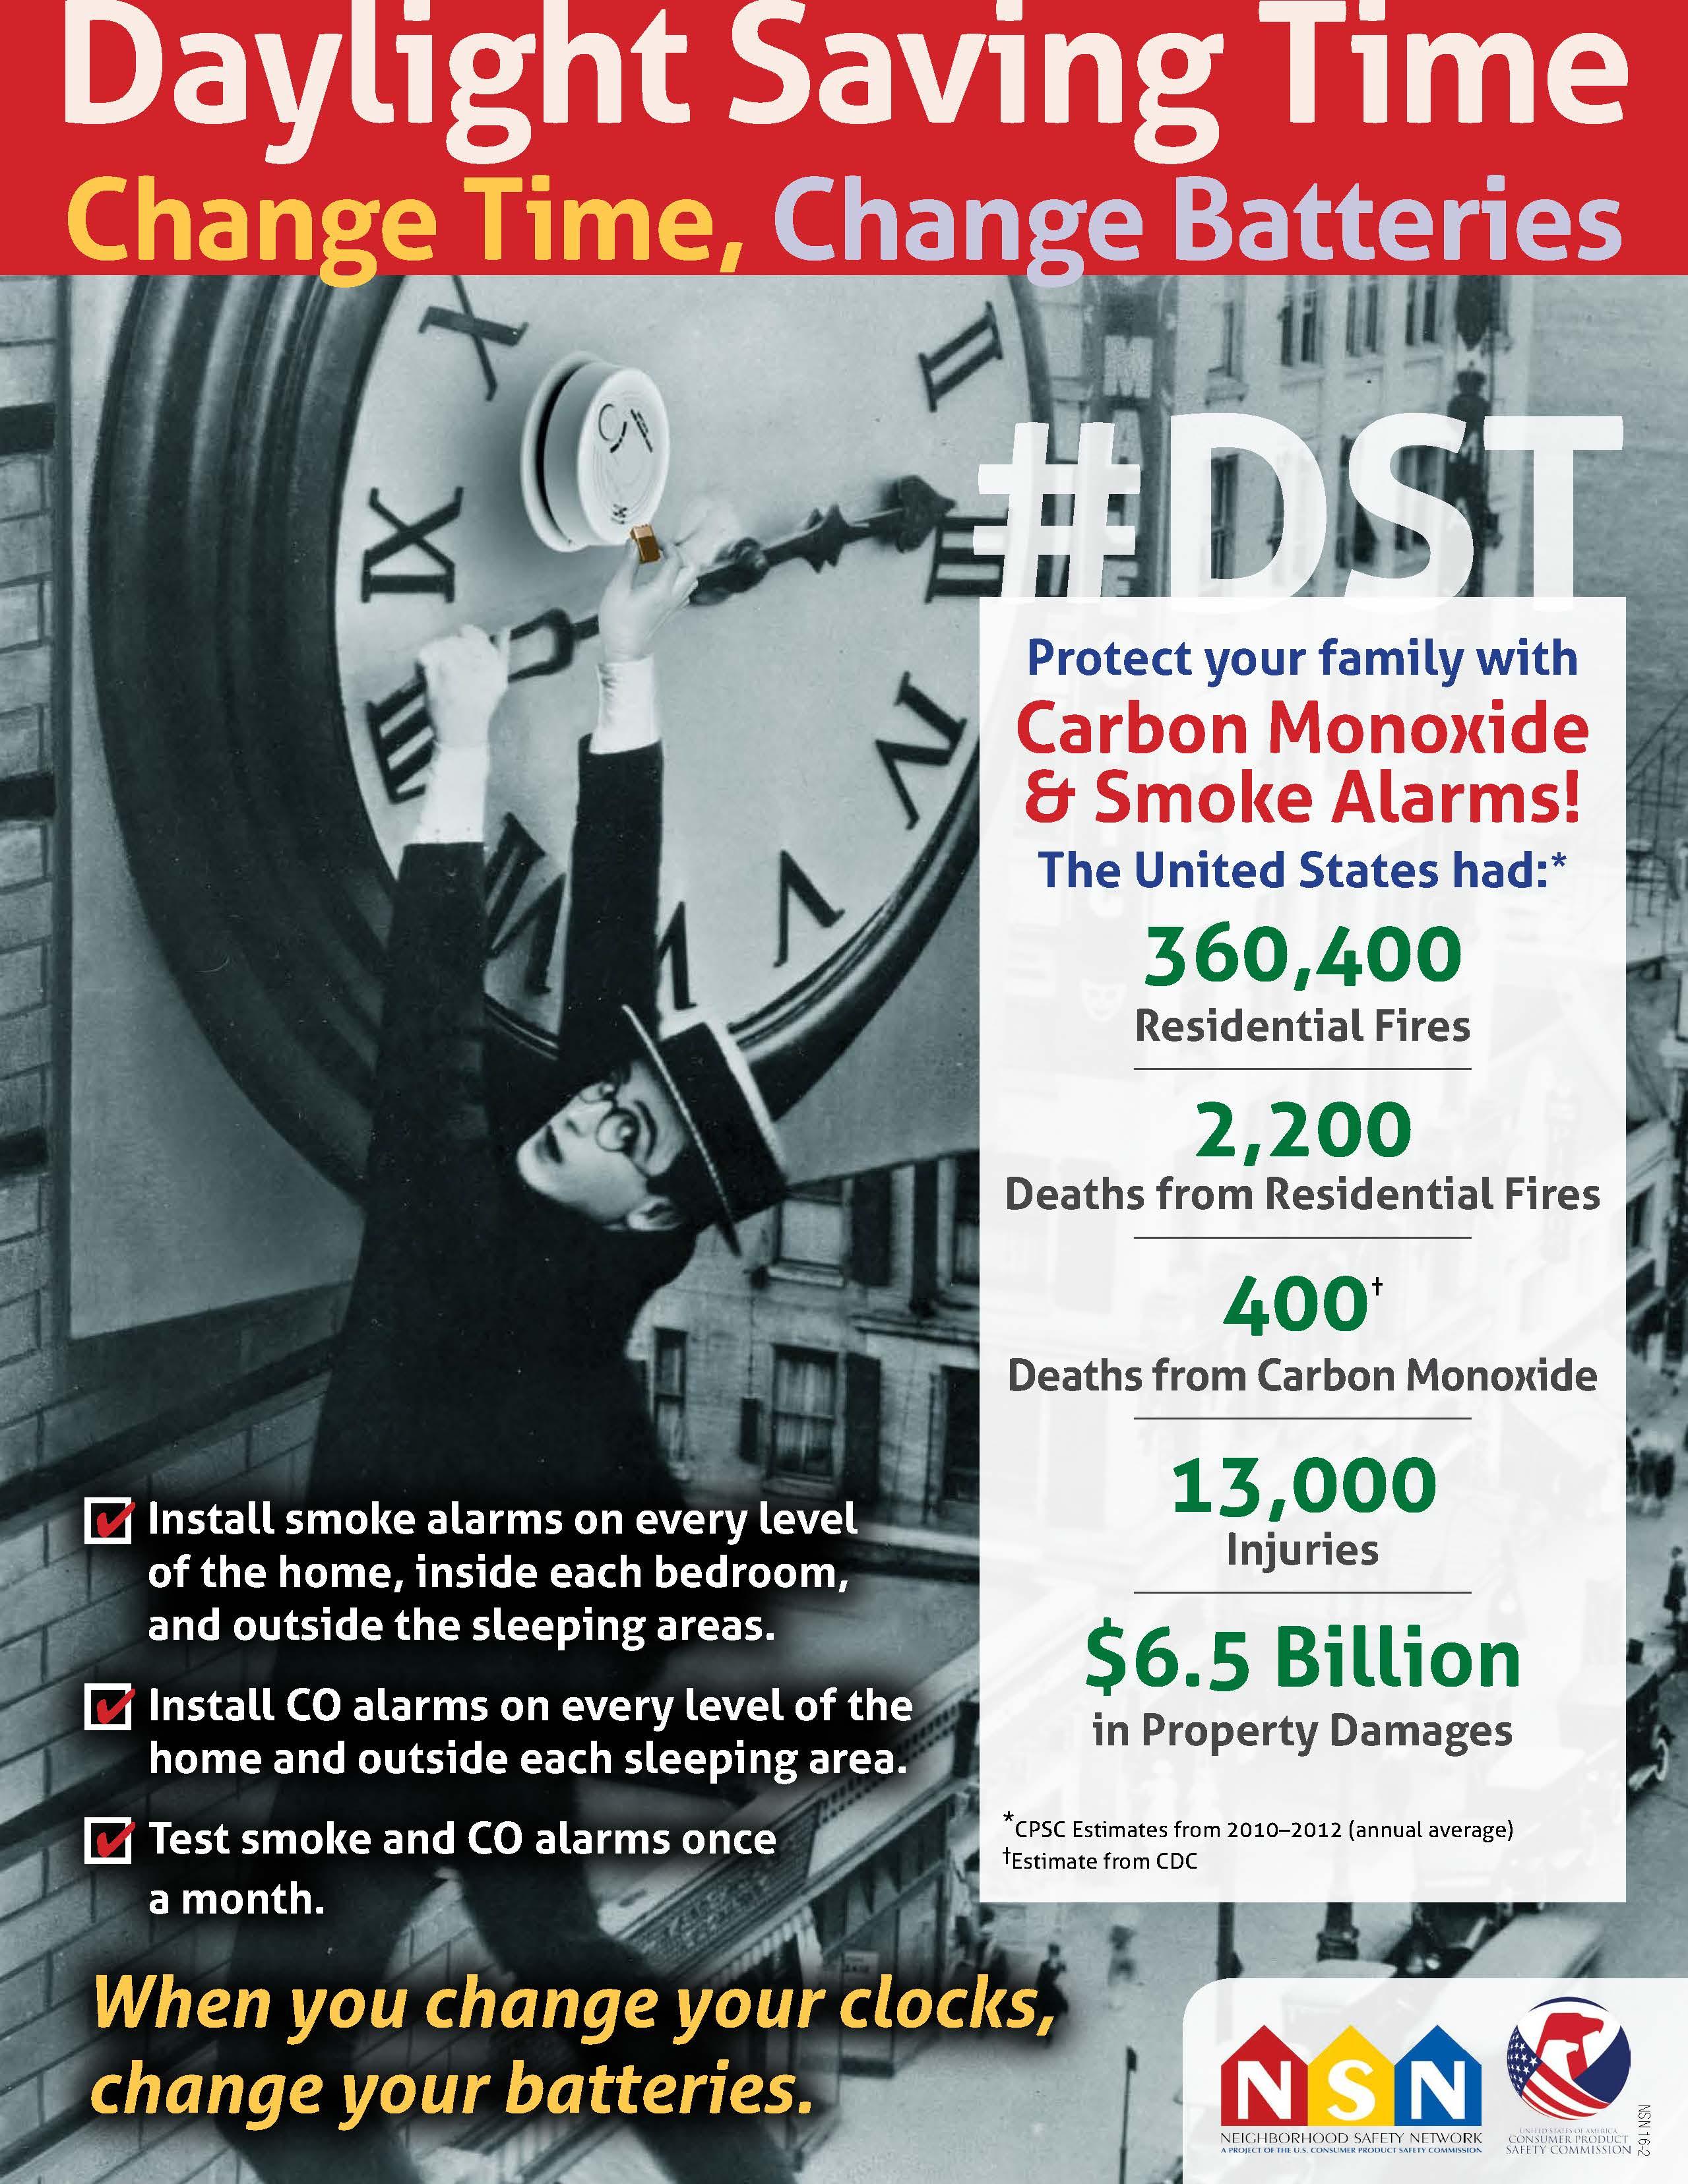 Daylight Savings Time Poster